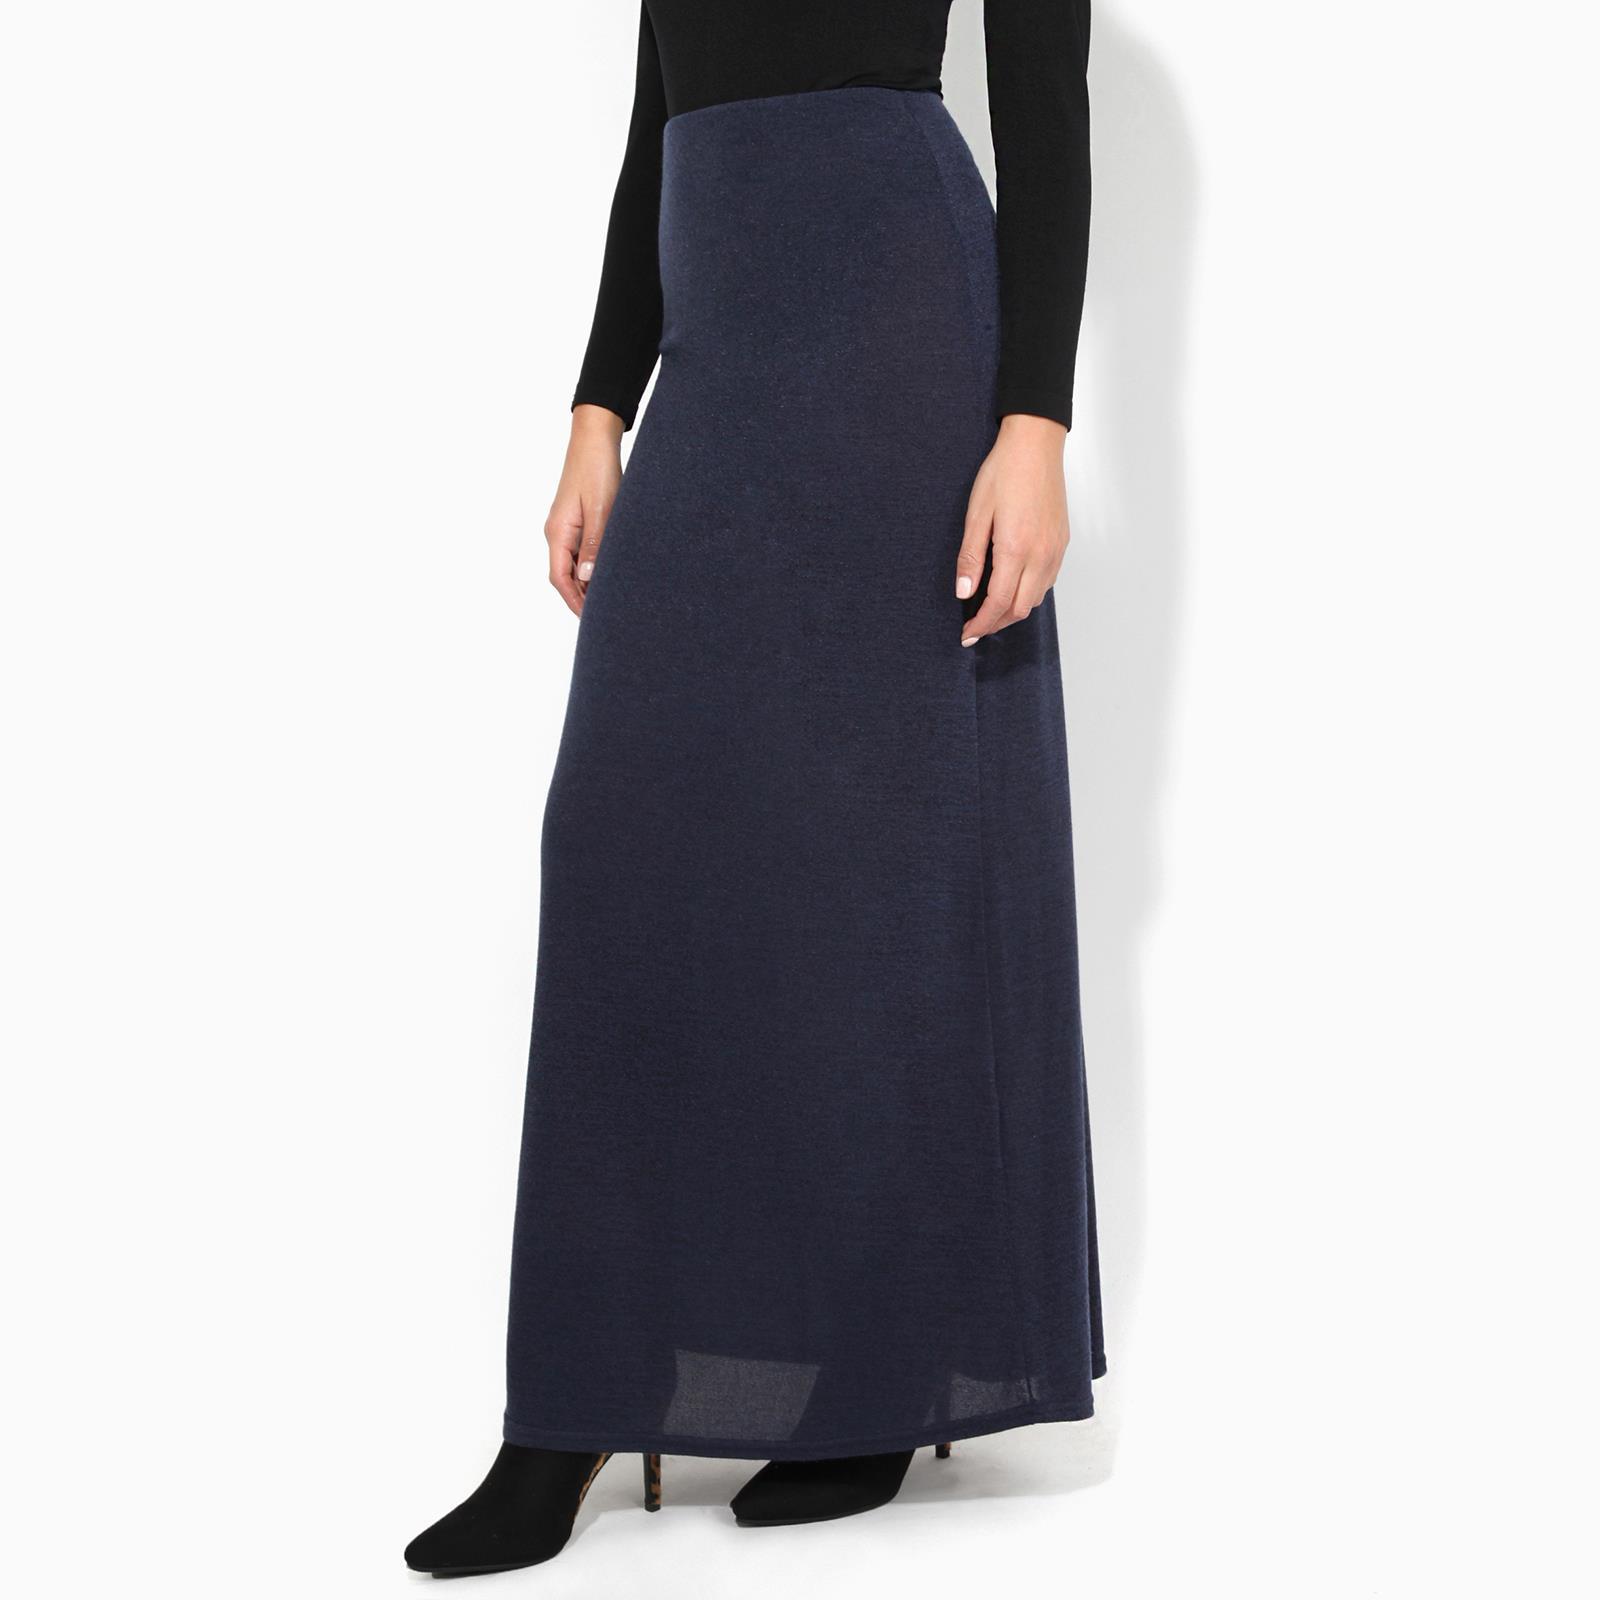 Womens-Ladies-Maxi-Skirt-High-Waist-A-Line-Long-Knit-Stretch-Bodycon-Casual-Boho thumbnail 14